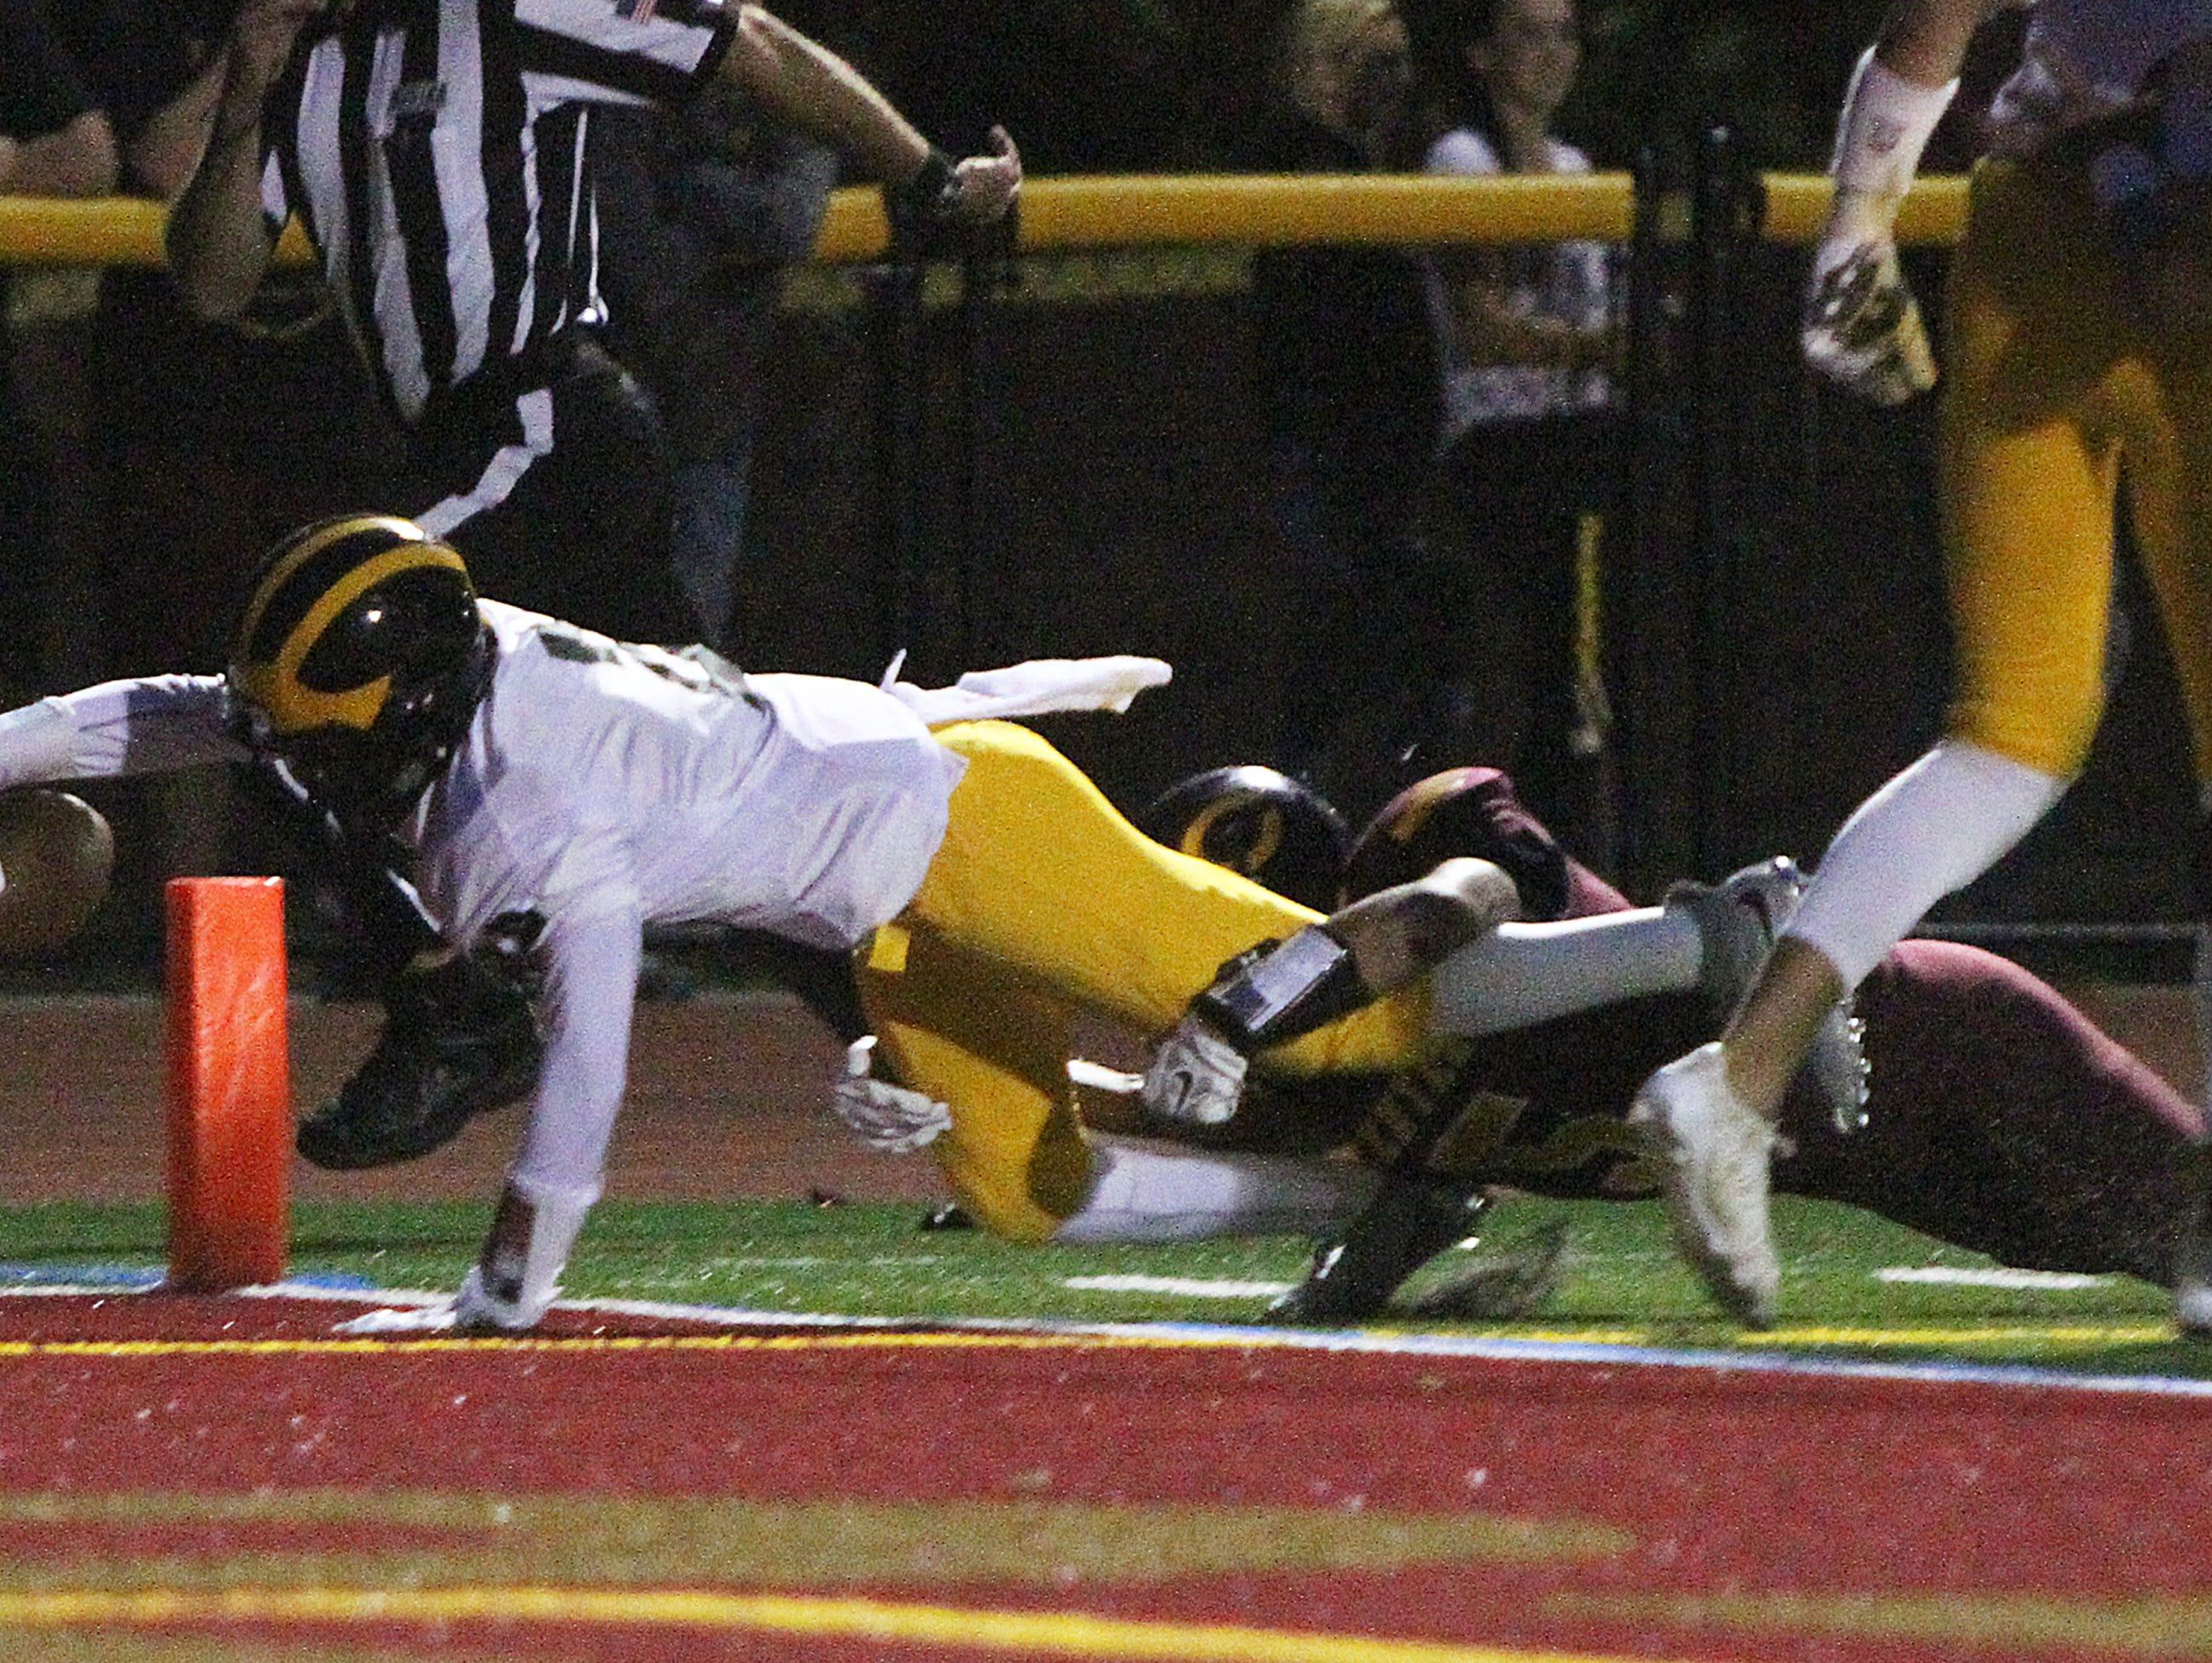 St. John Vianney at Central Regional High School football game held in Berkeley Twp. on Friday September 25 , 2015. Here St. John Vianney's # 2 Khalil Hakins dives in for a touchdown.